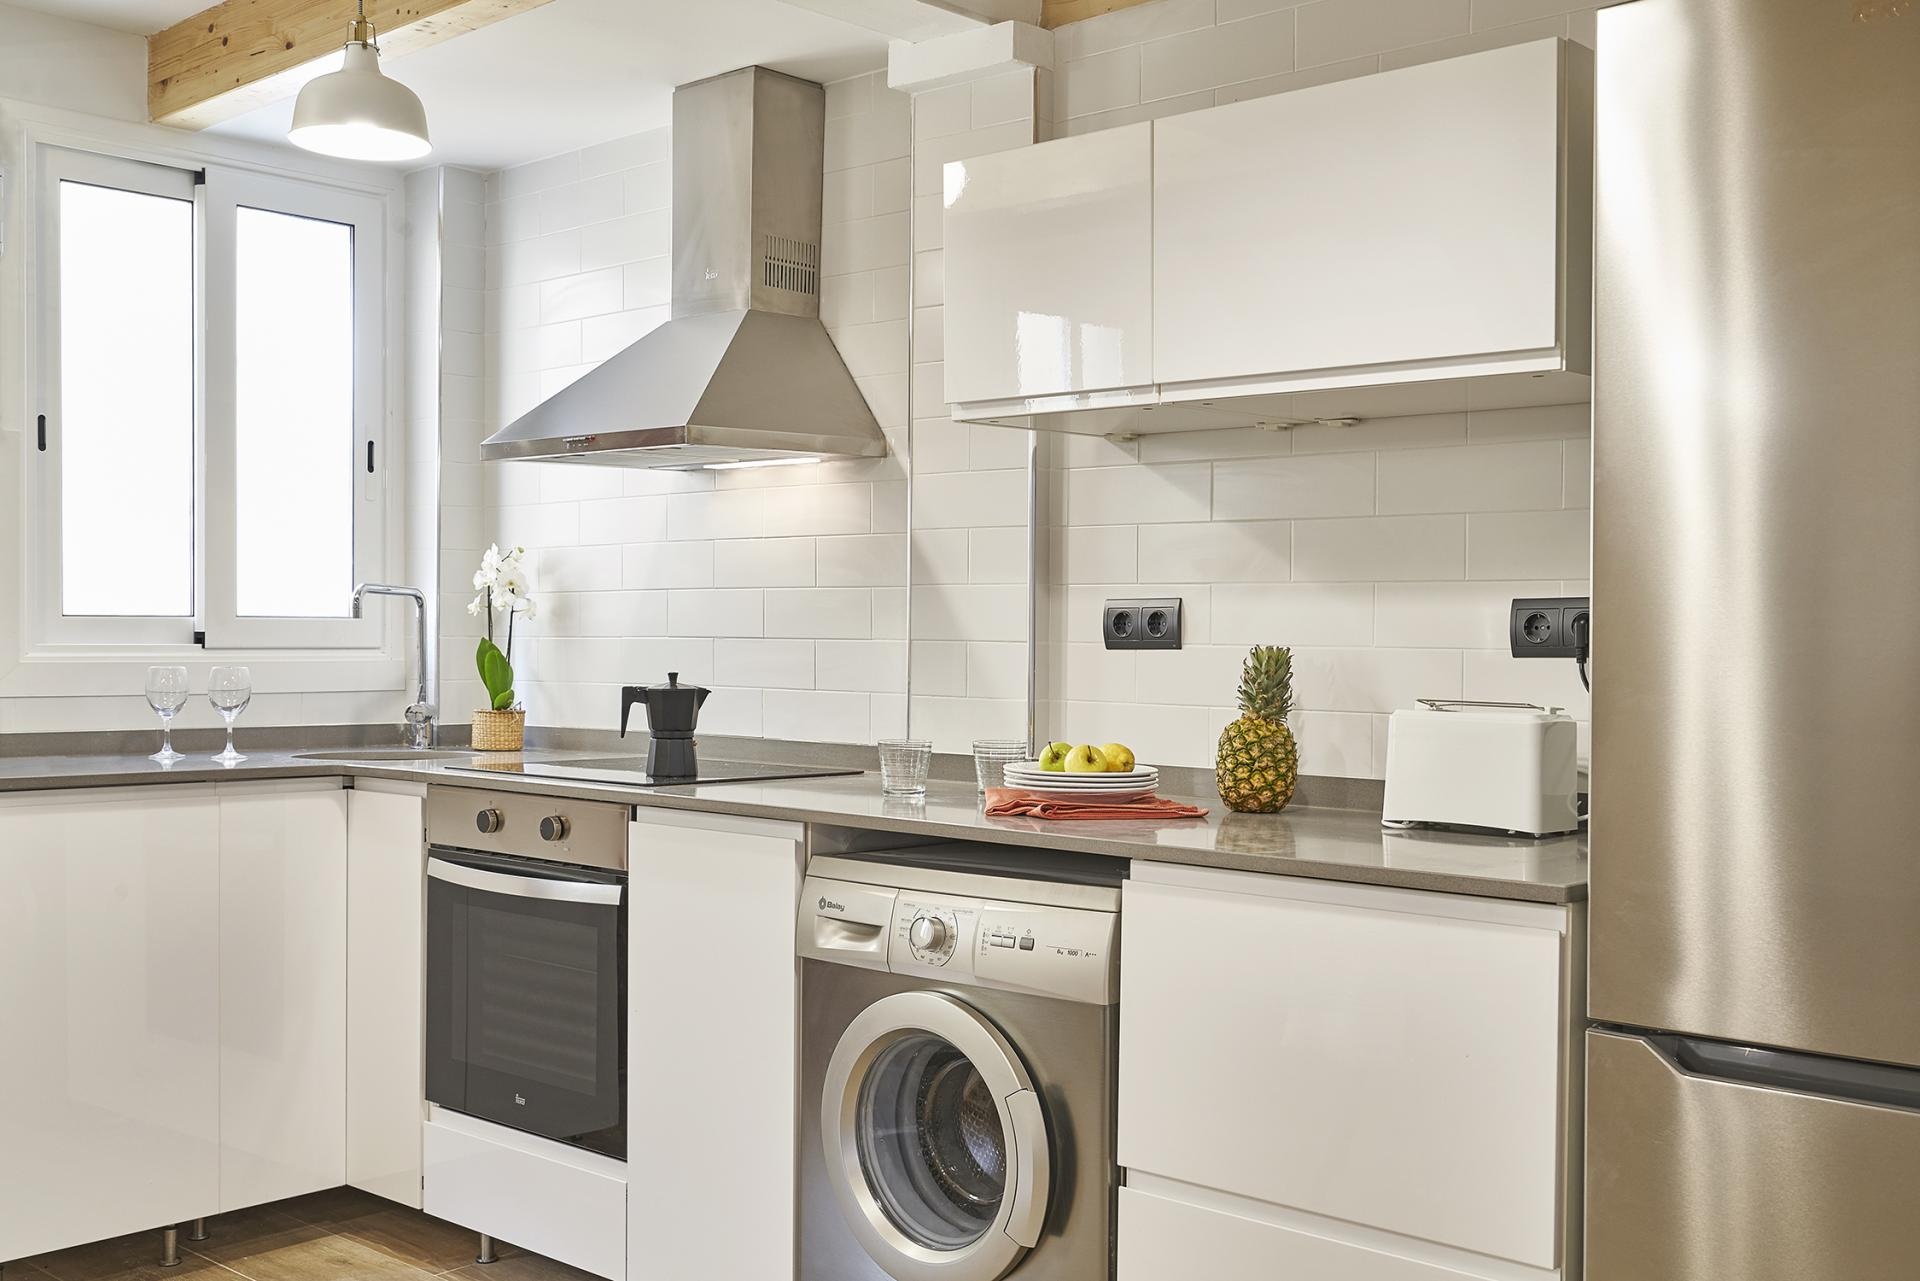 Kitchen at Eixample Duplex Apartment - Citybase Apartments